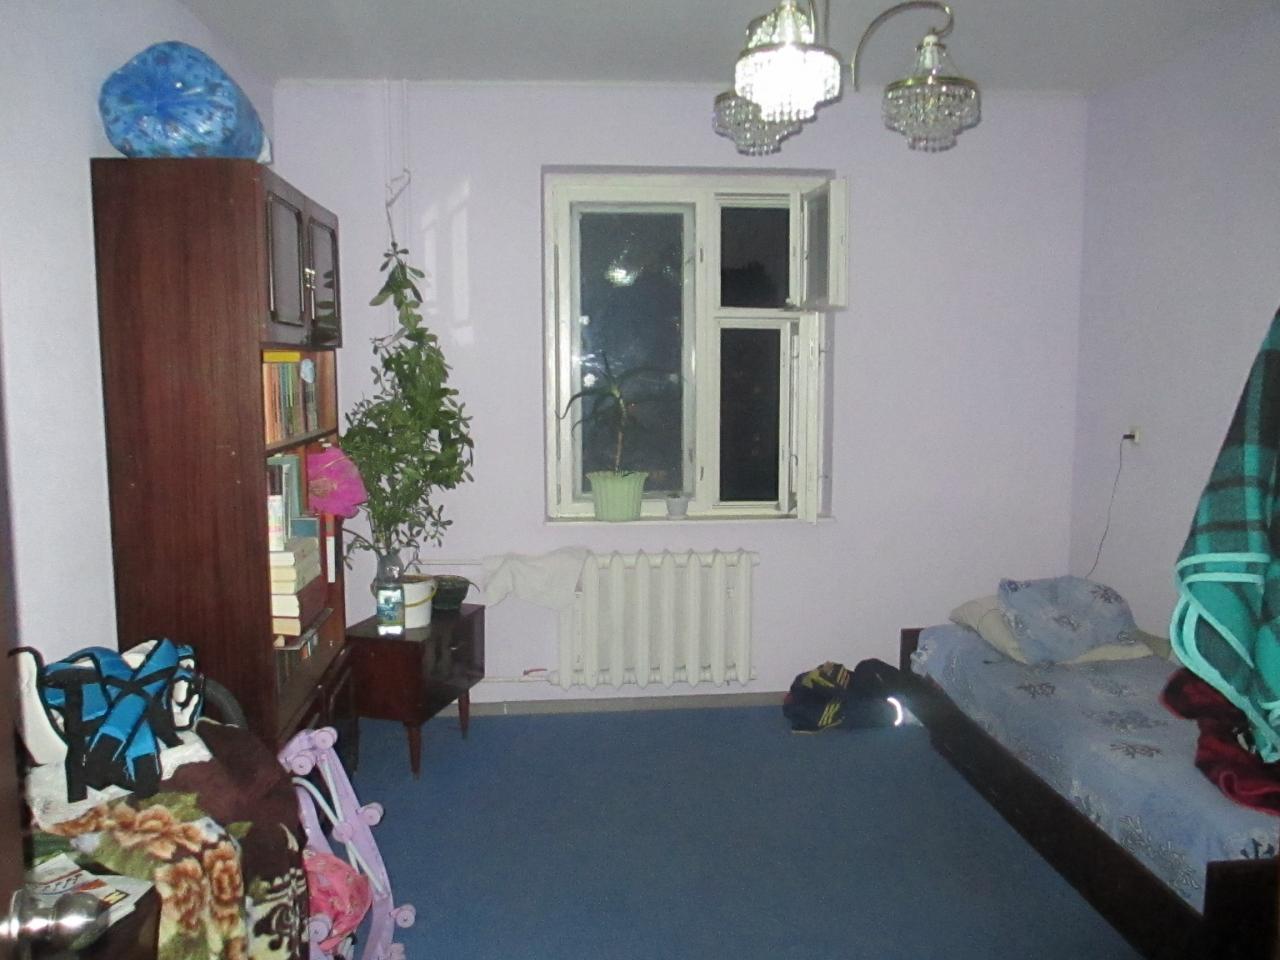 Фото 5 - Продам квартиру Киев, Вишняковская ул.